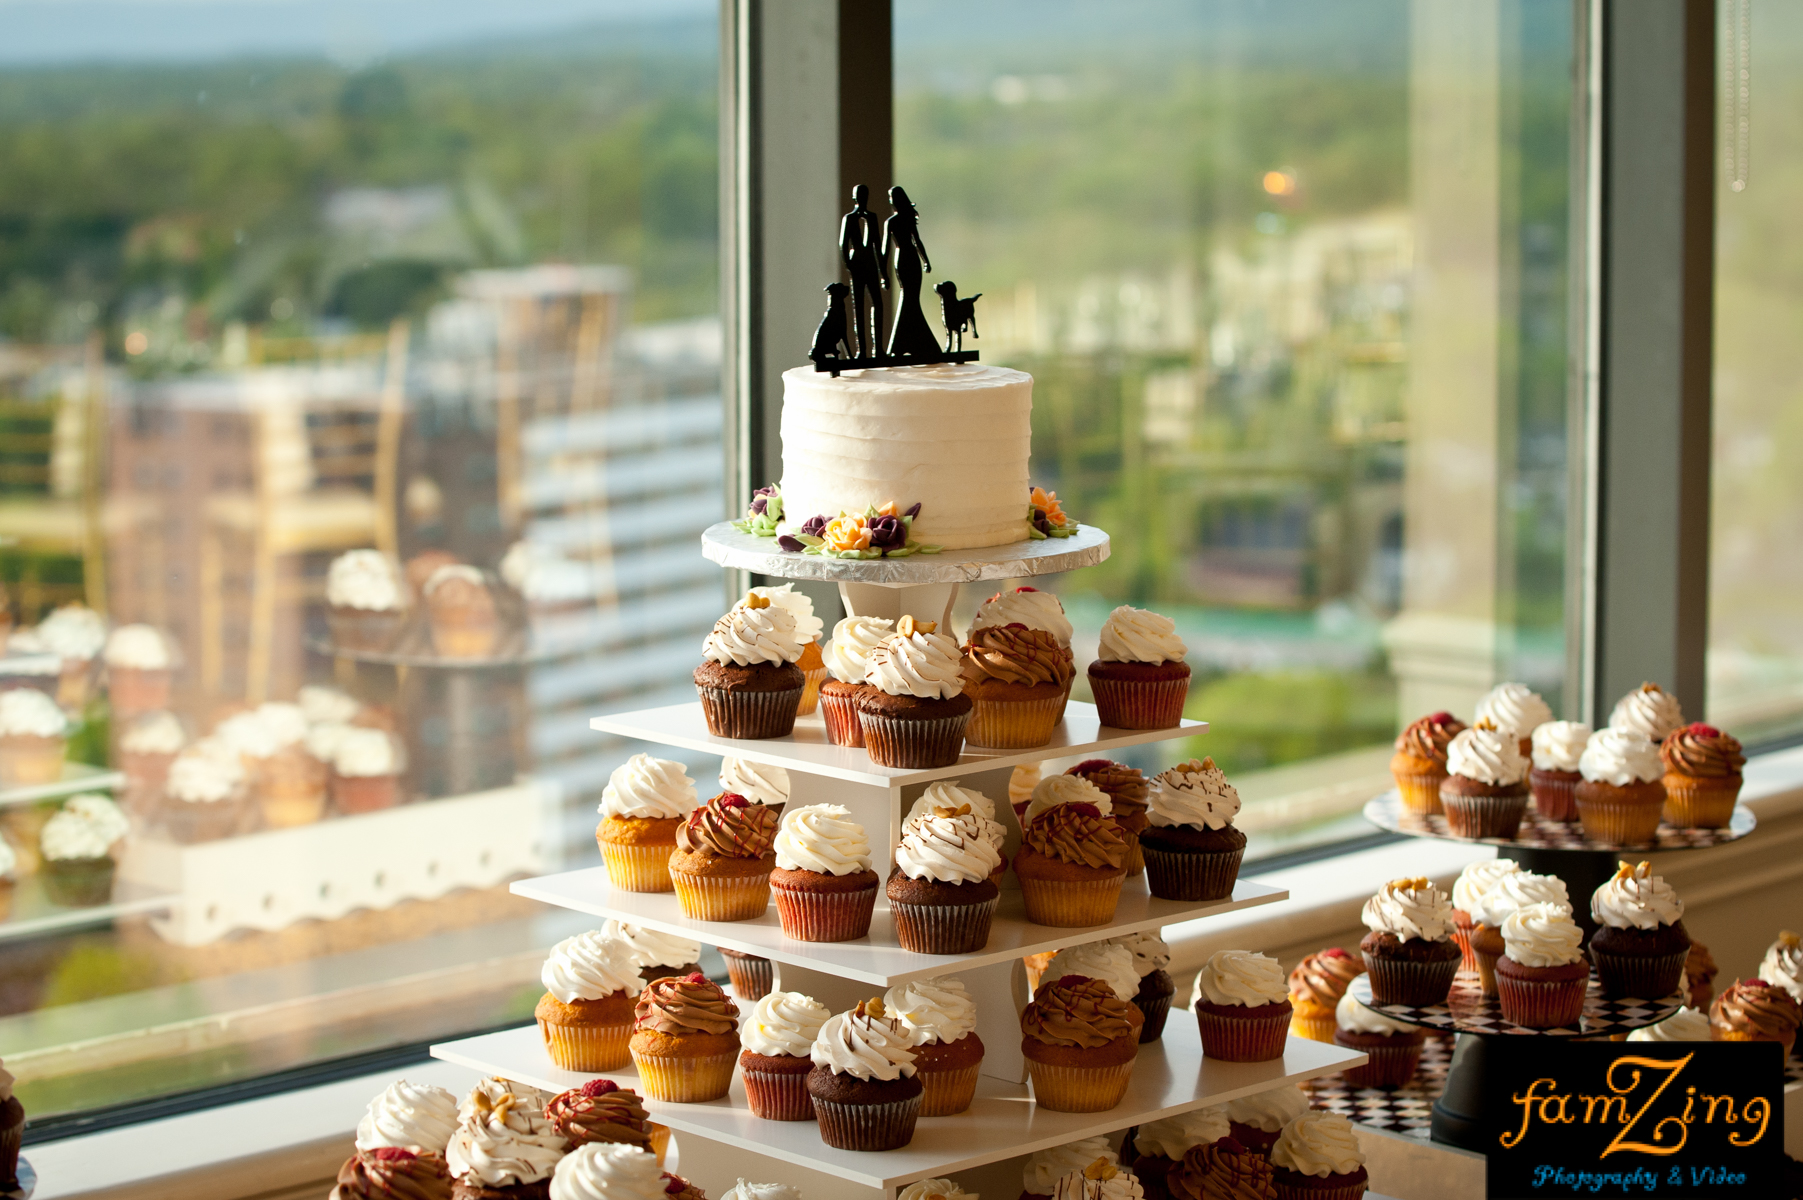 cupcakes food wedding greenville sc south carolina commerce club downtown greenville spartanburg anderson cake eat wedding ceremony reception premiere party entertainment music dj djs disc jockey